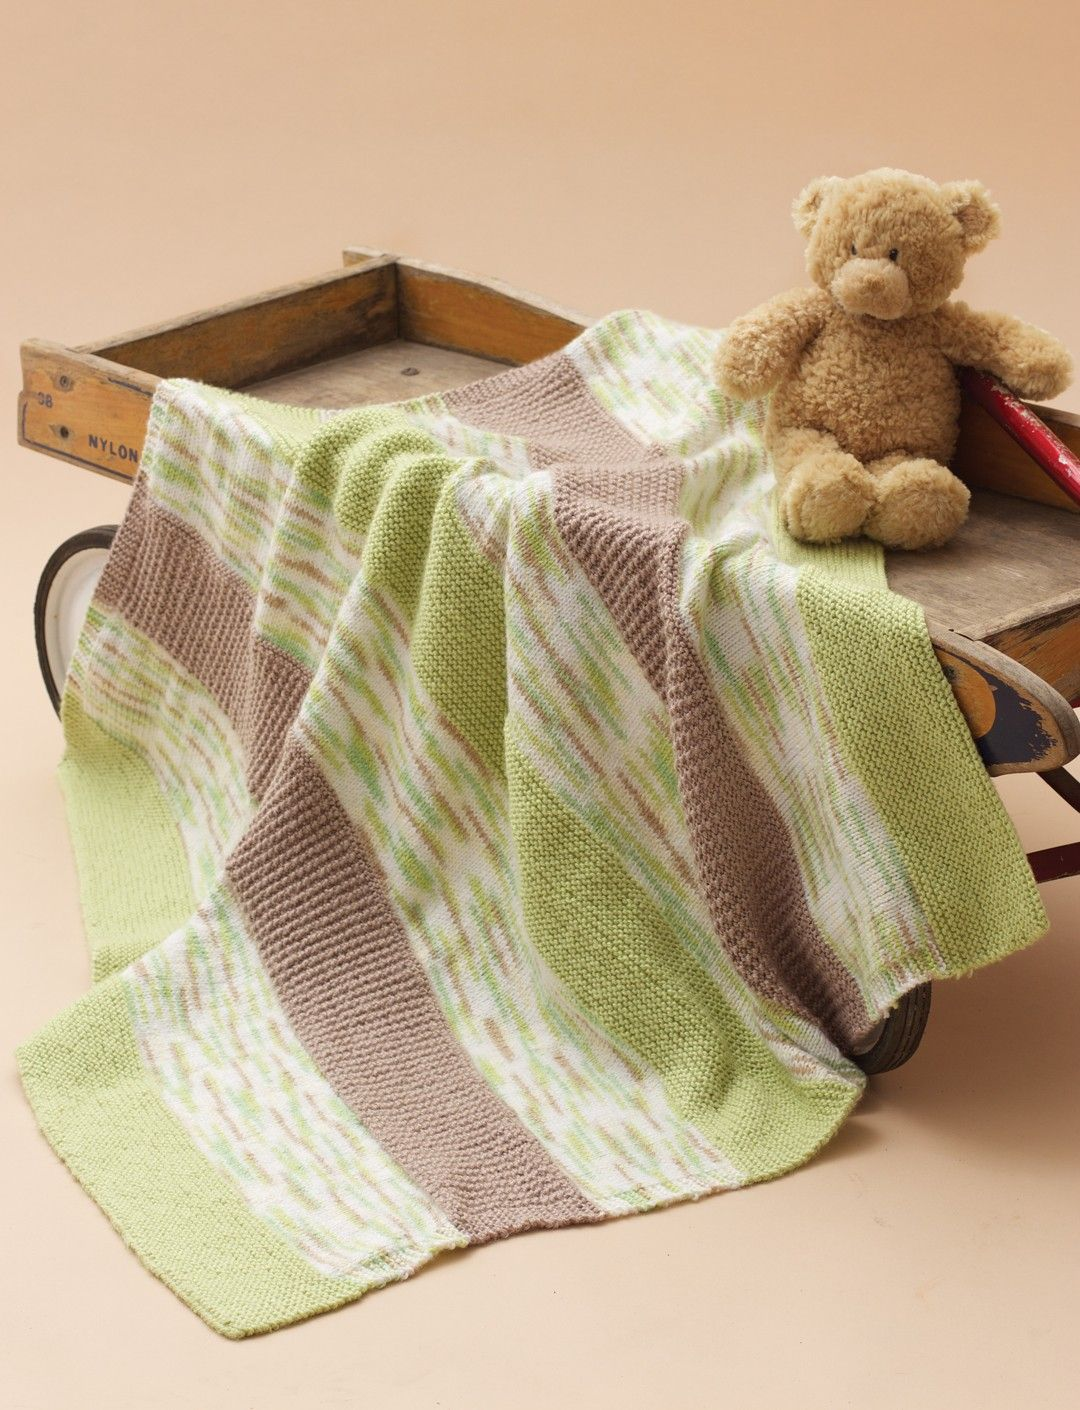 Yarnspirations.com - Bernat Textured Baby Blanket ...